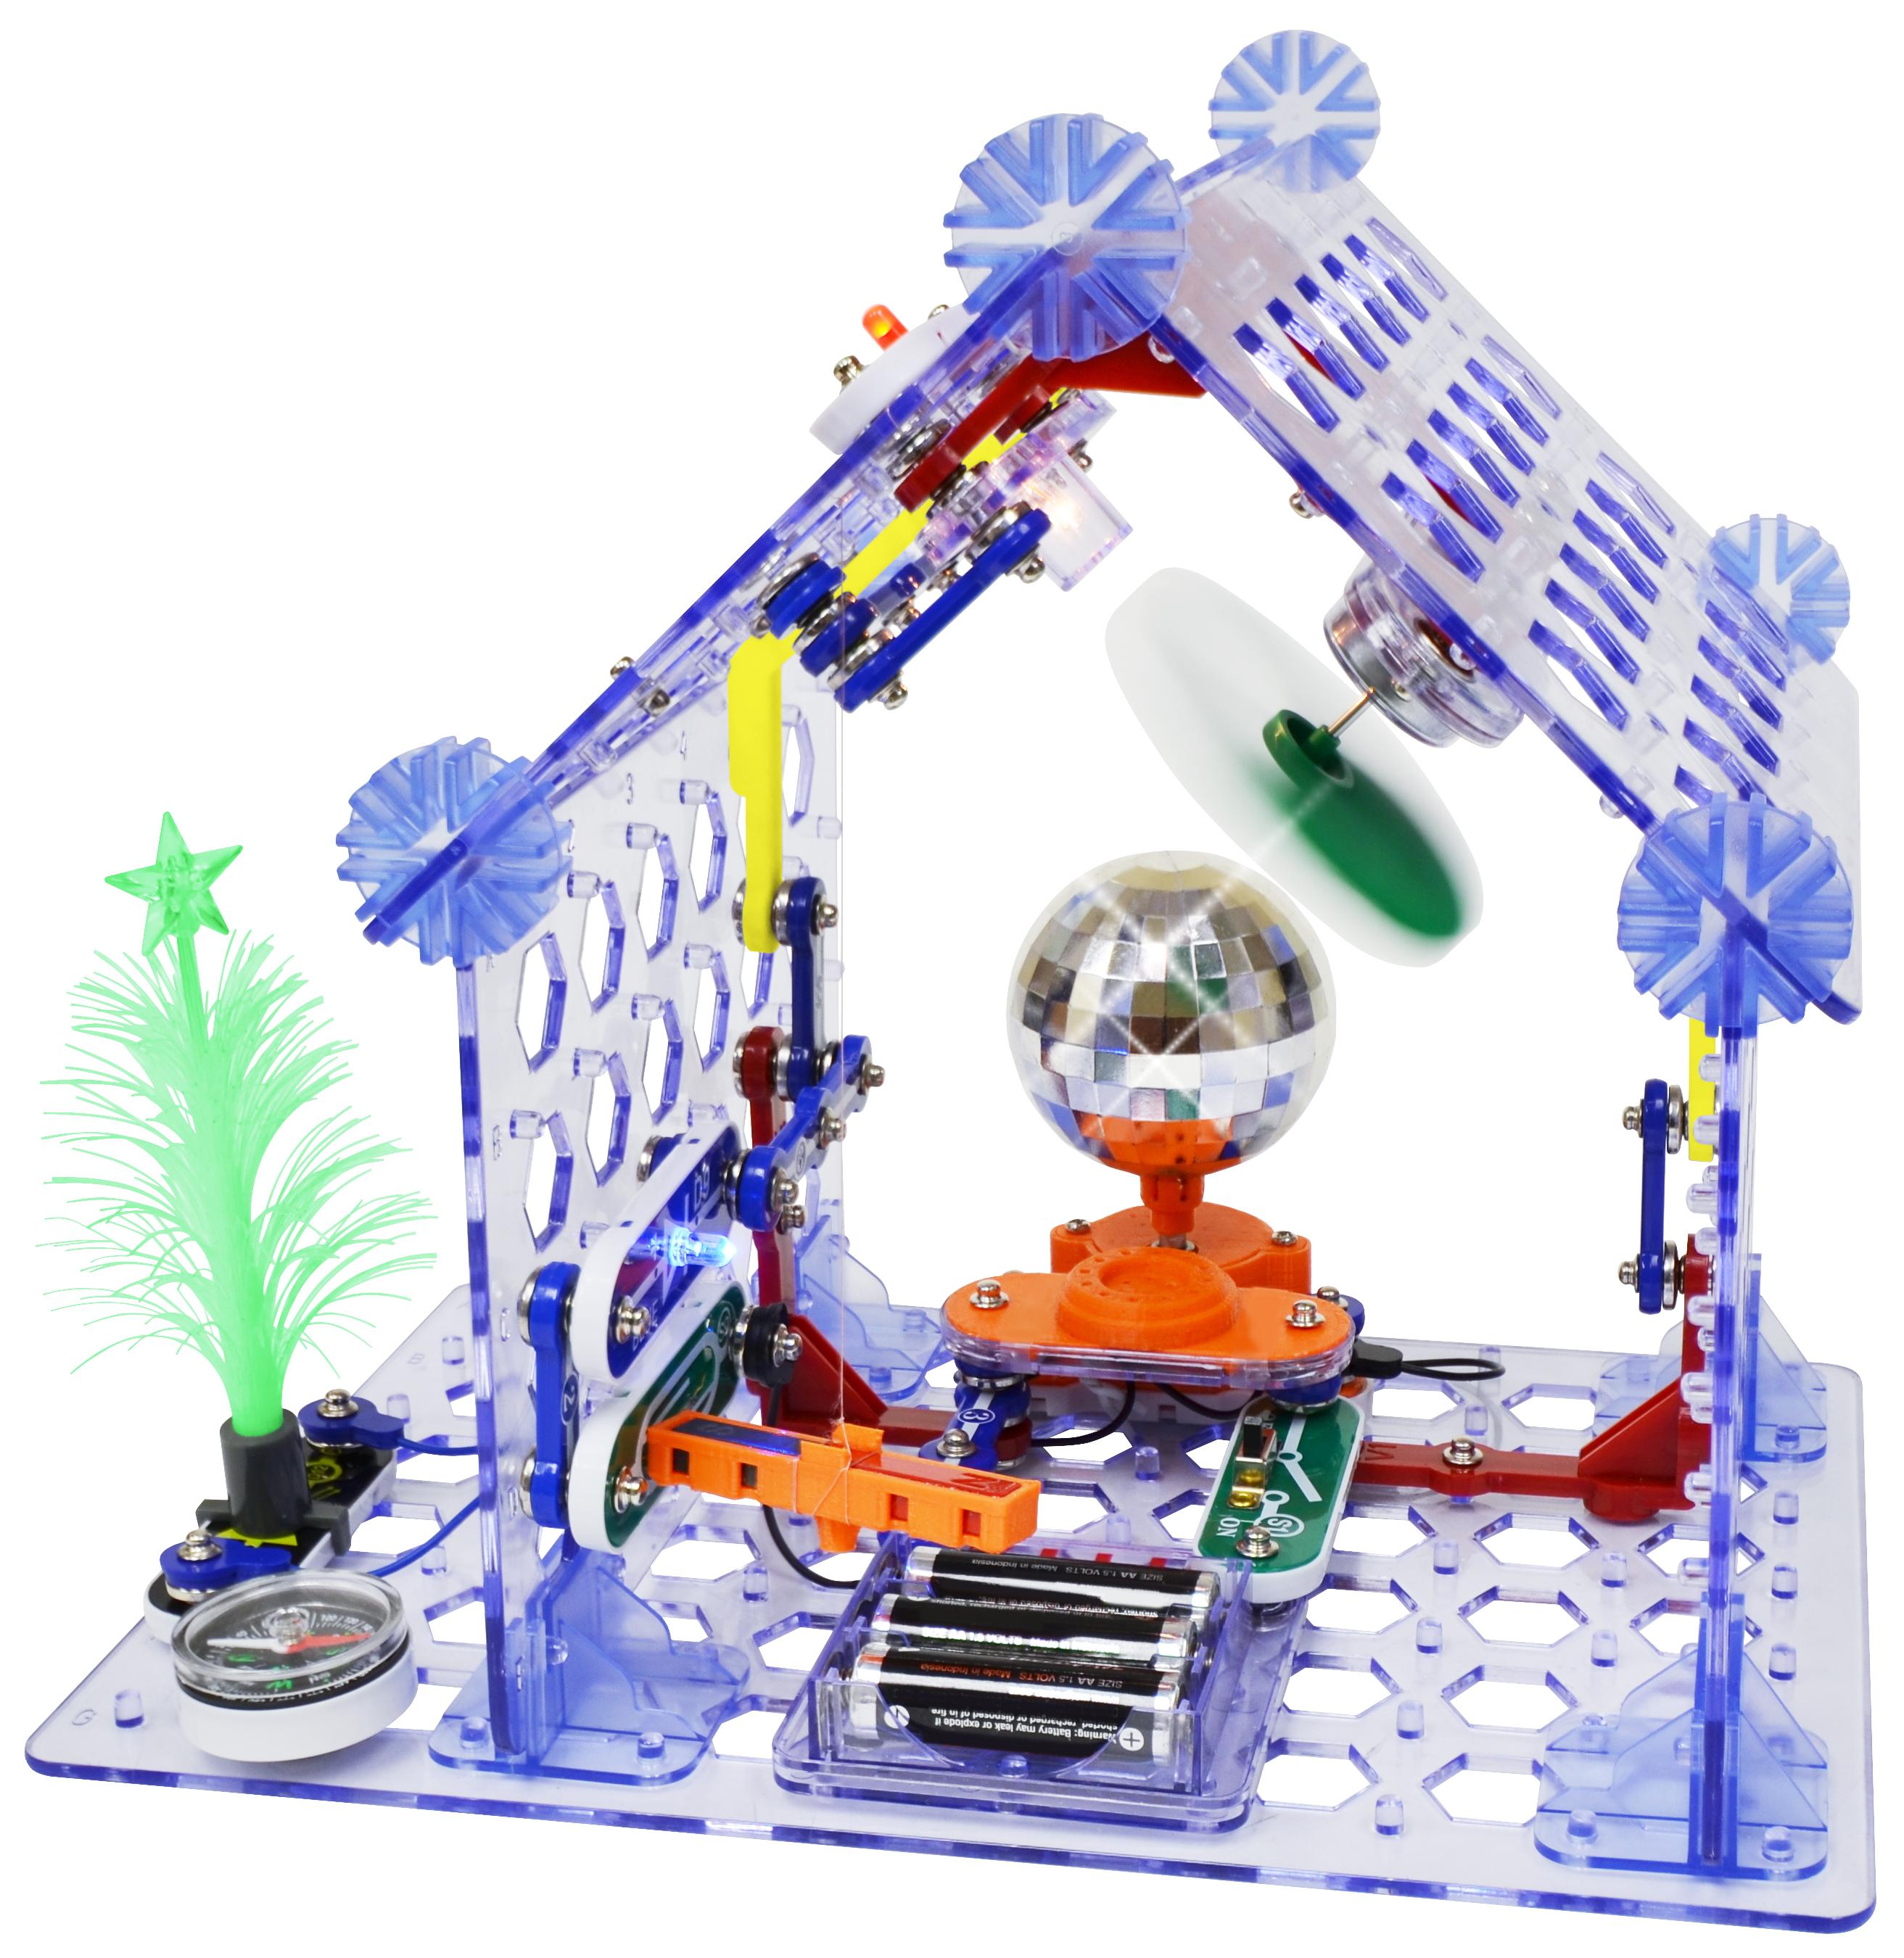 Snap Circuits Stem Toys Elenco Electronics Kits